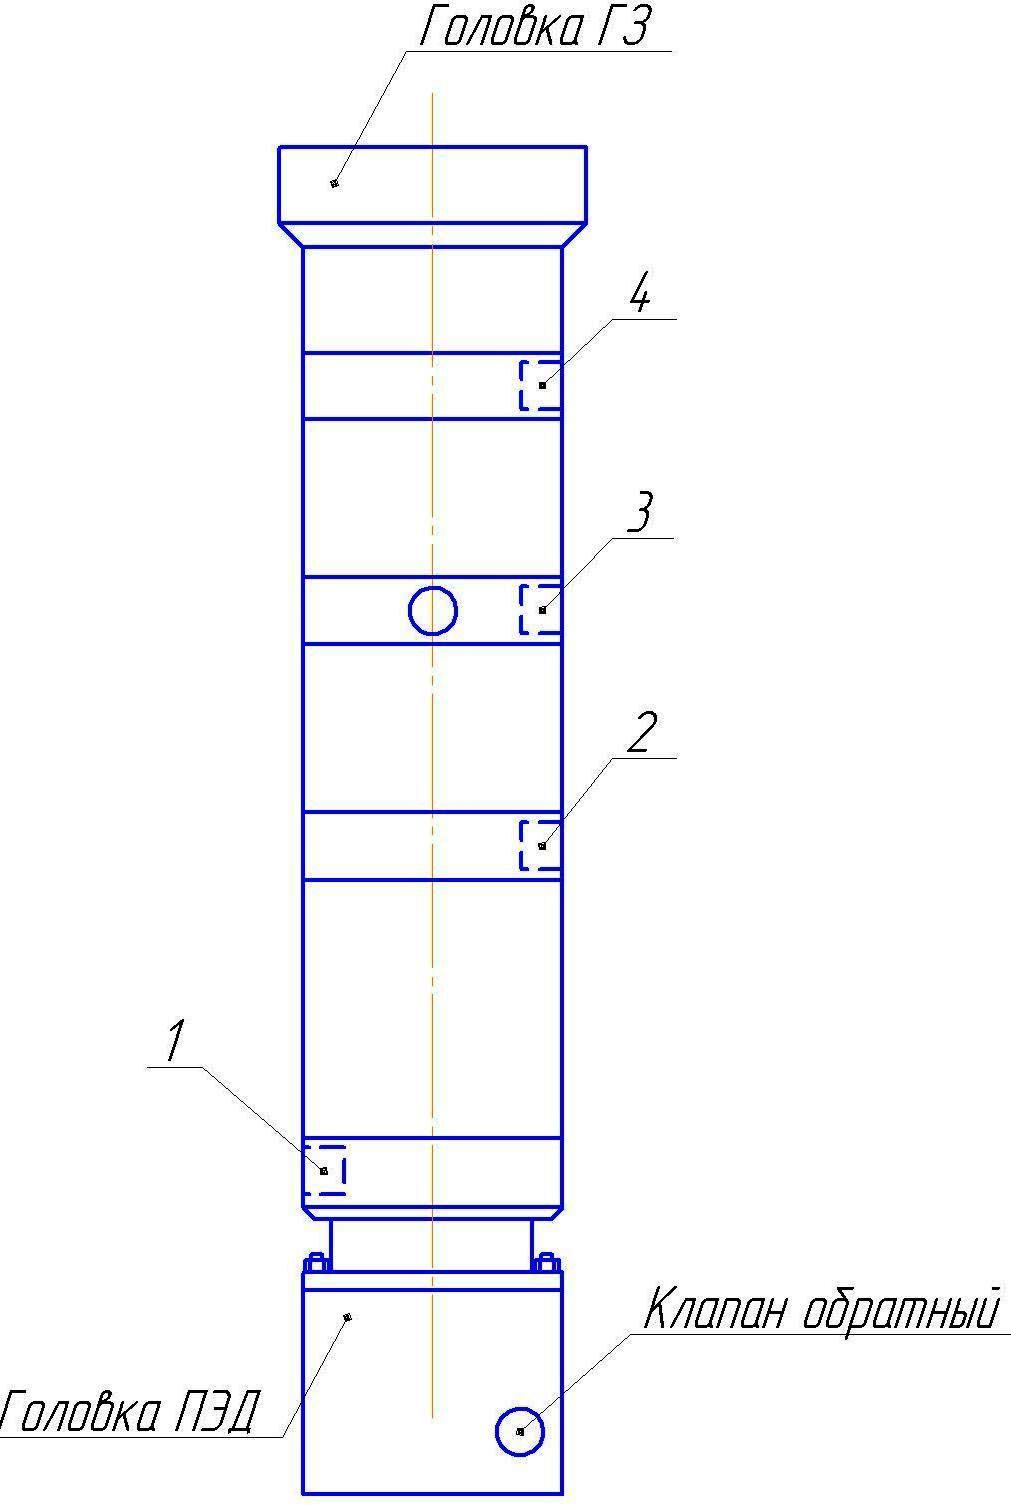 Гидрозащита ПА-92ДЛм1 (ПА-92ДЛКу), ПА-92ДЛм2 (ПА-92ДЛКум)